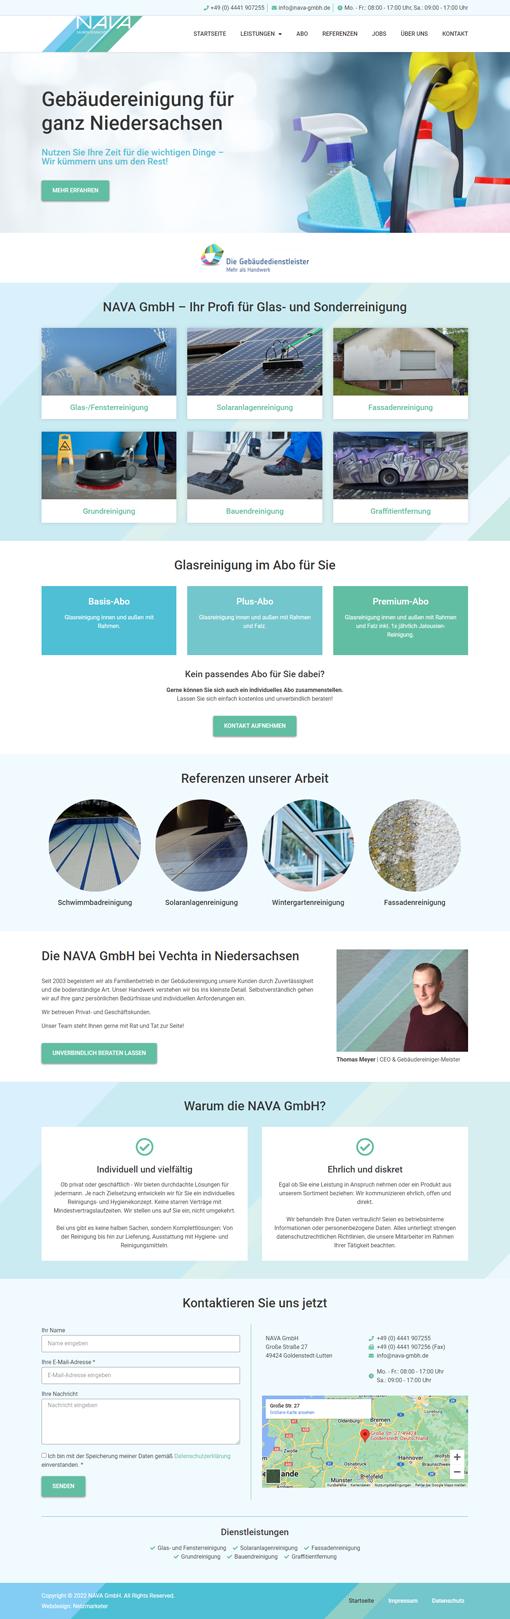 Meyer - Website